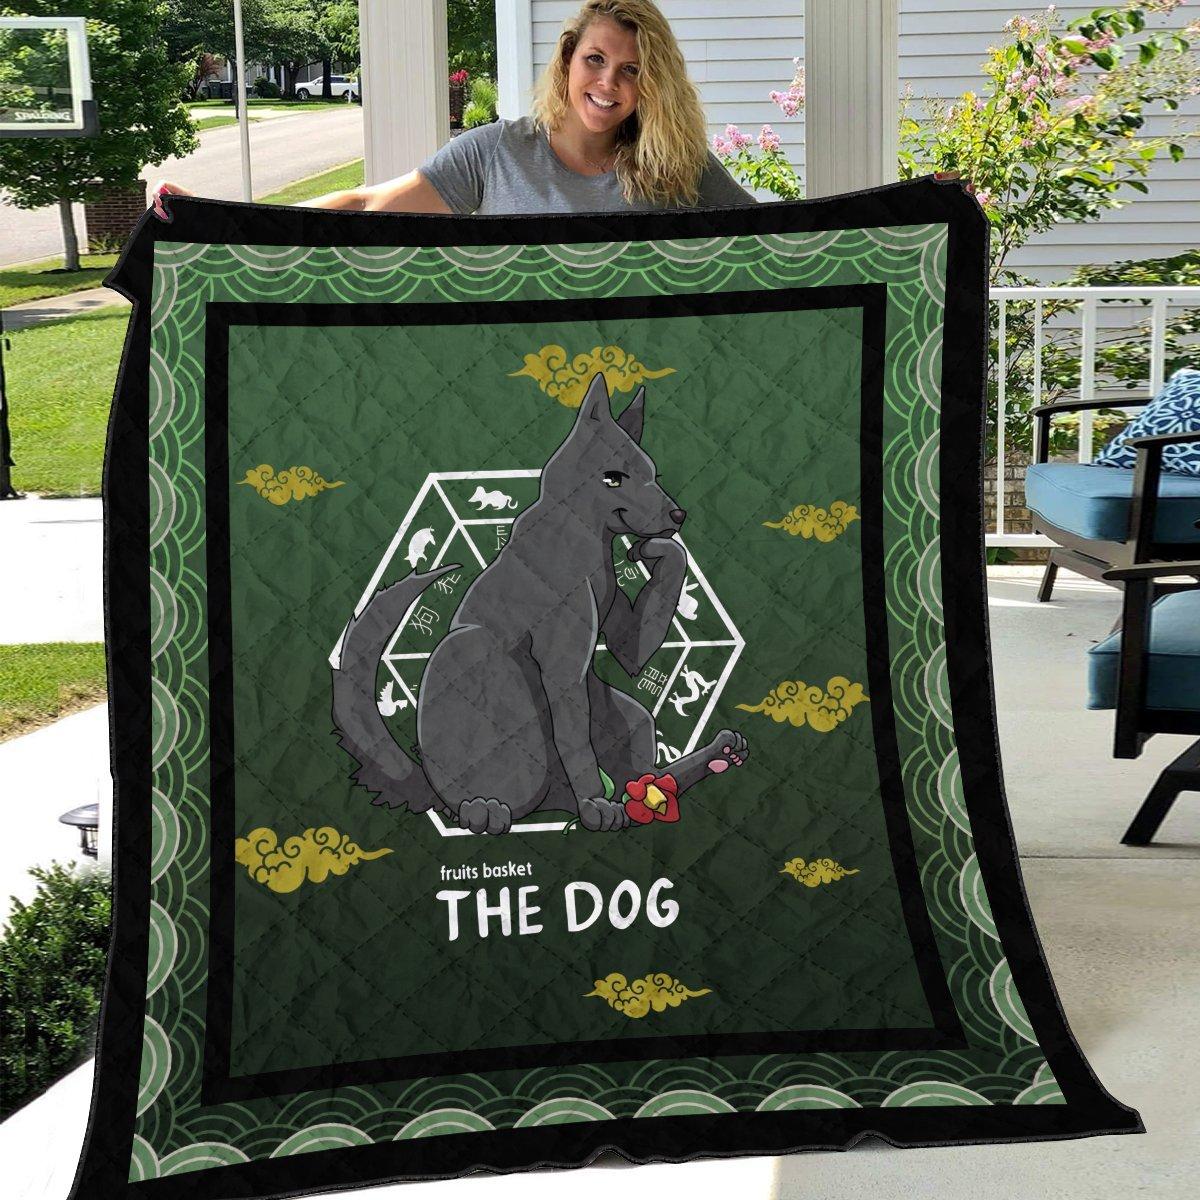 shigure the dog quilt blanket 894151 - Otaku Treat